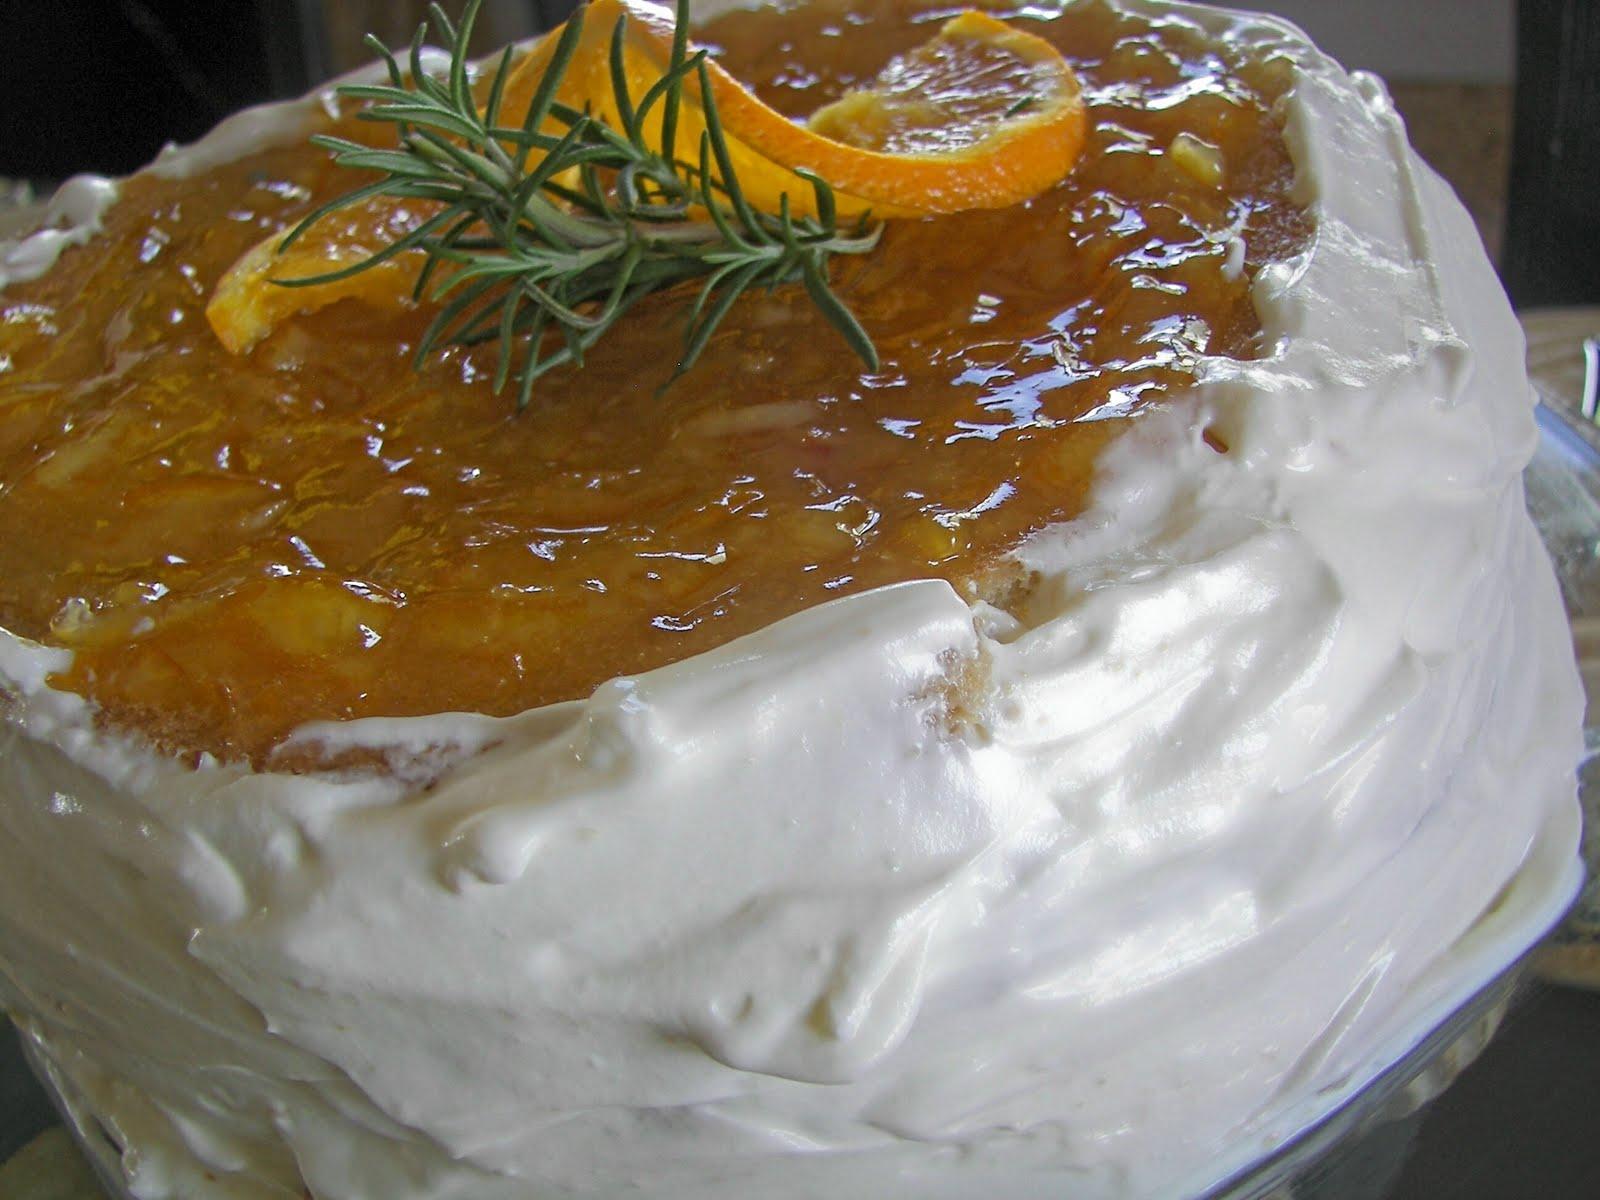 Esther's Orange Marmalade Layer Cake